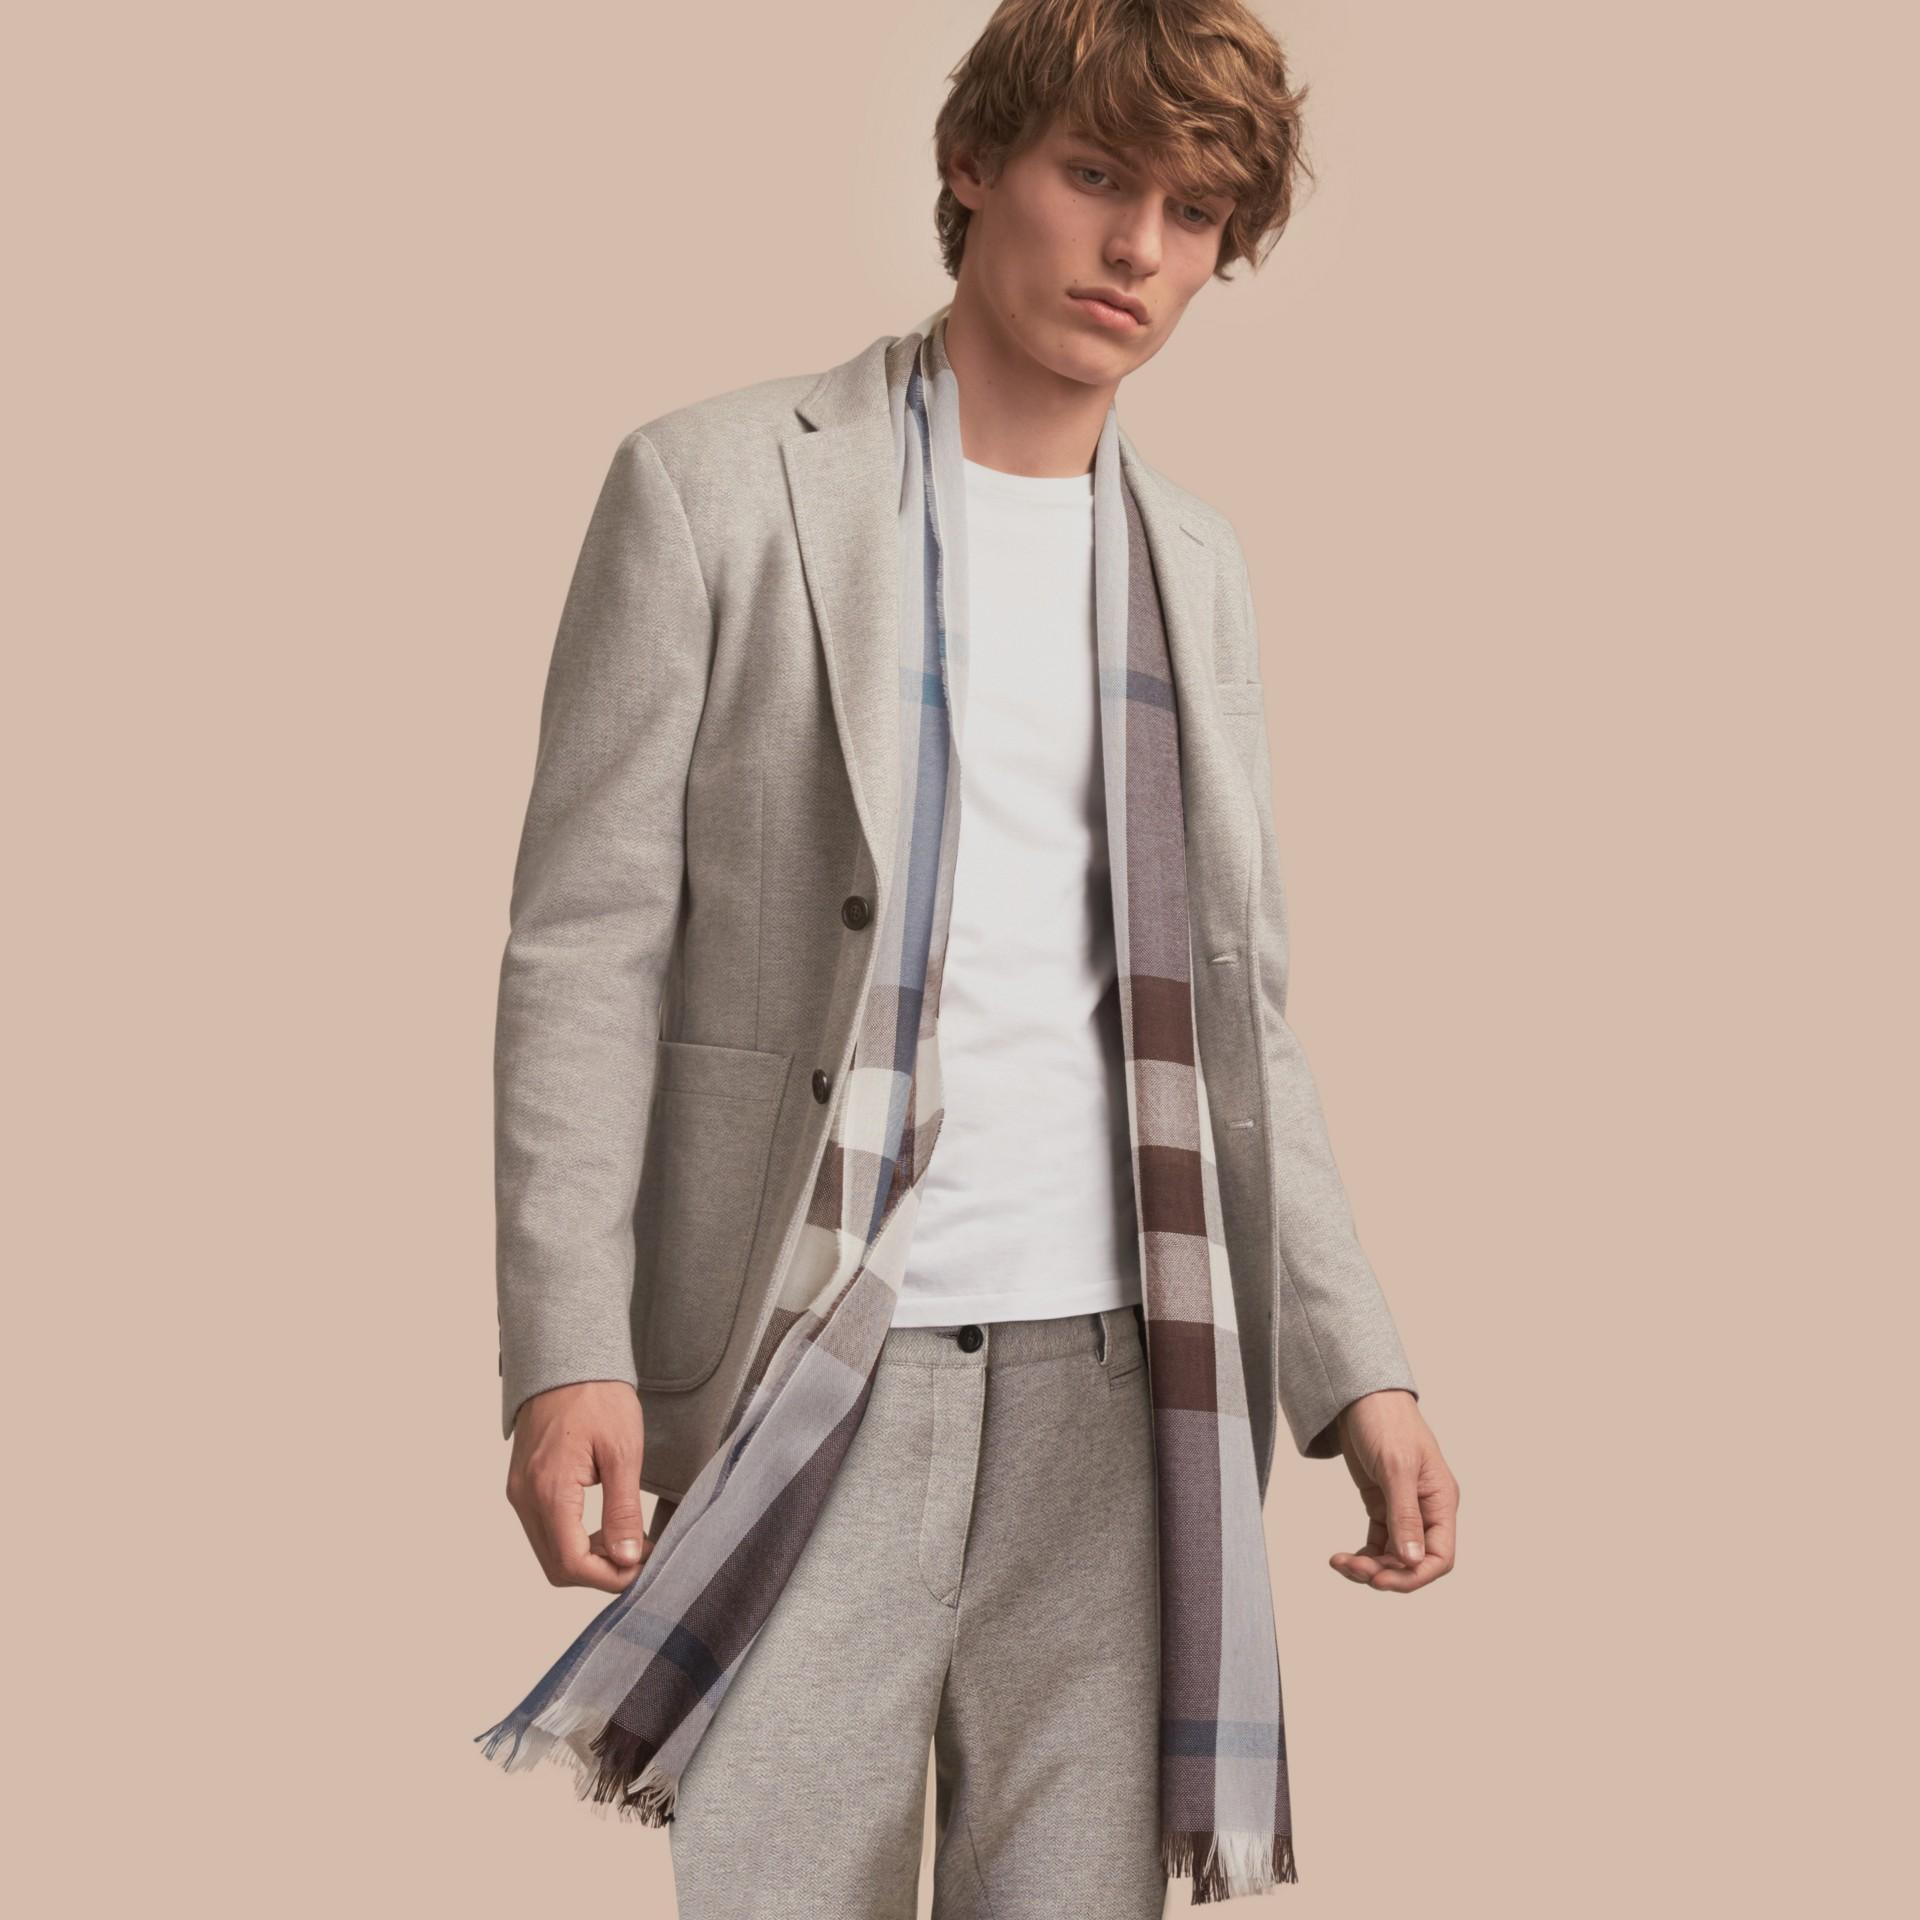 Herringbone Cotton Blend Jersey Blazer - gallery image 1